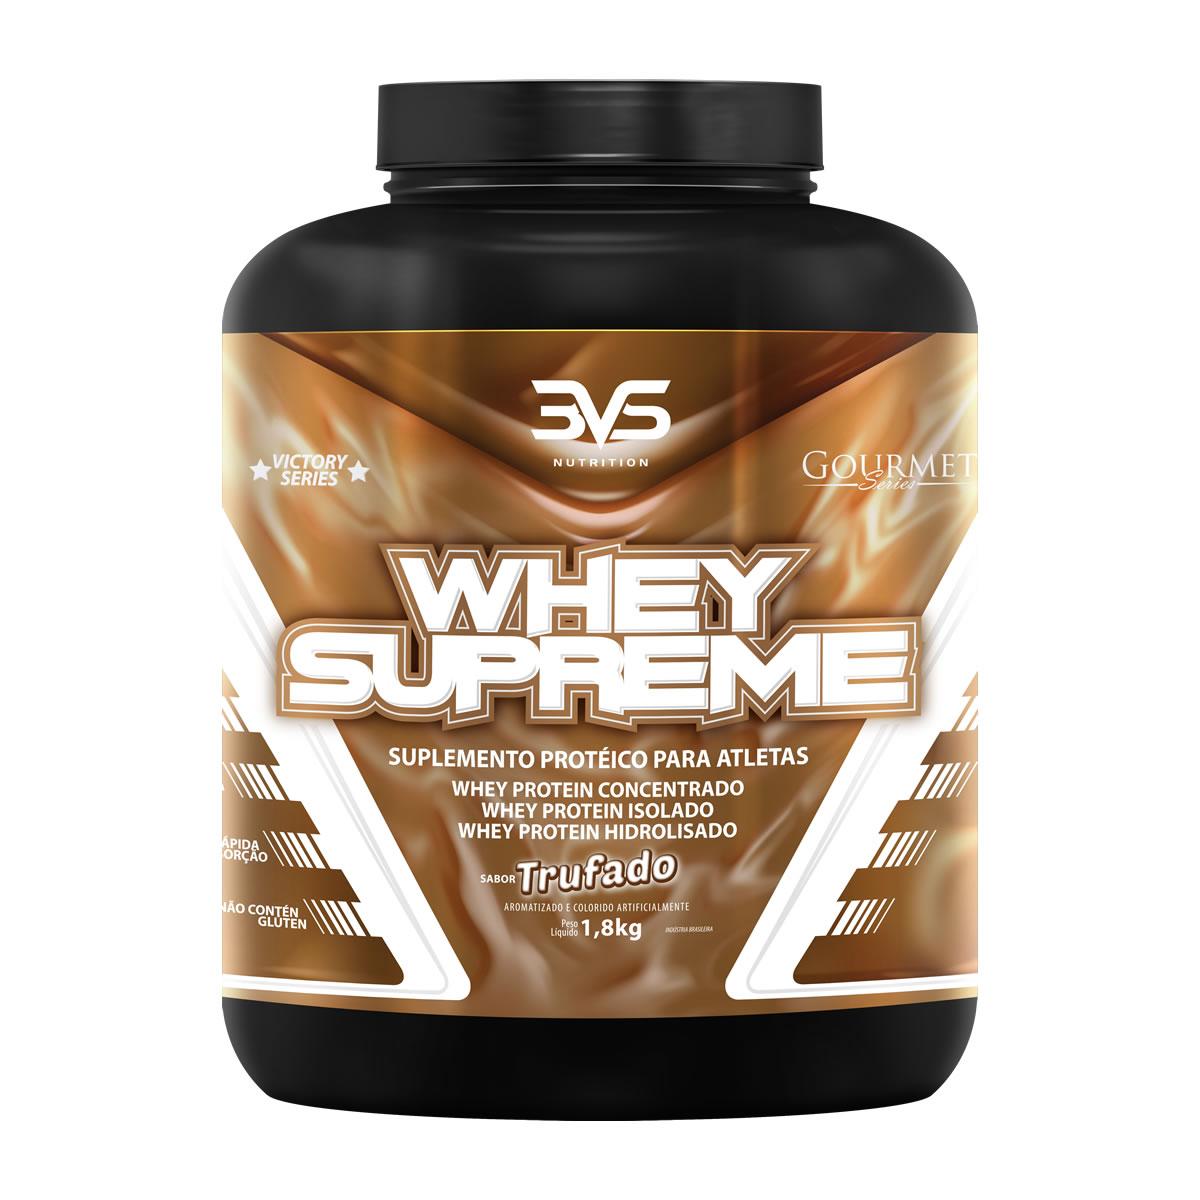 Supreme Whey 3W 1,8KG - 3VS Nutrition